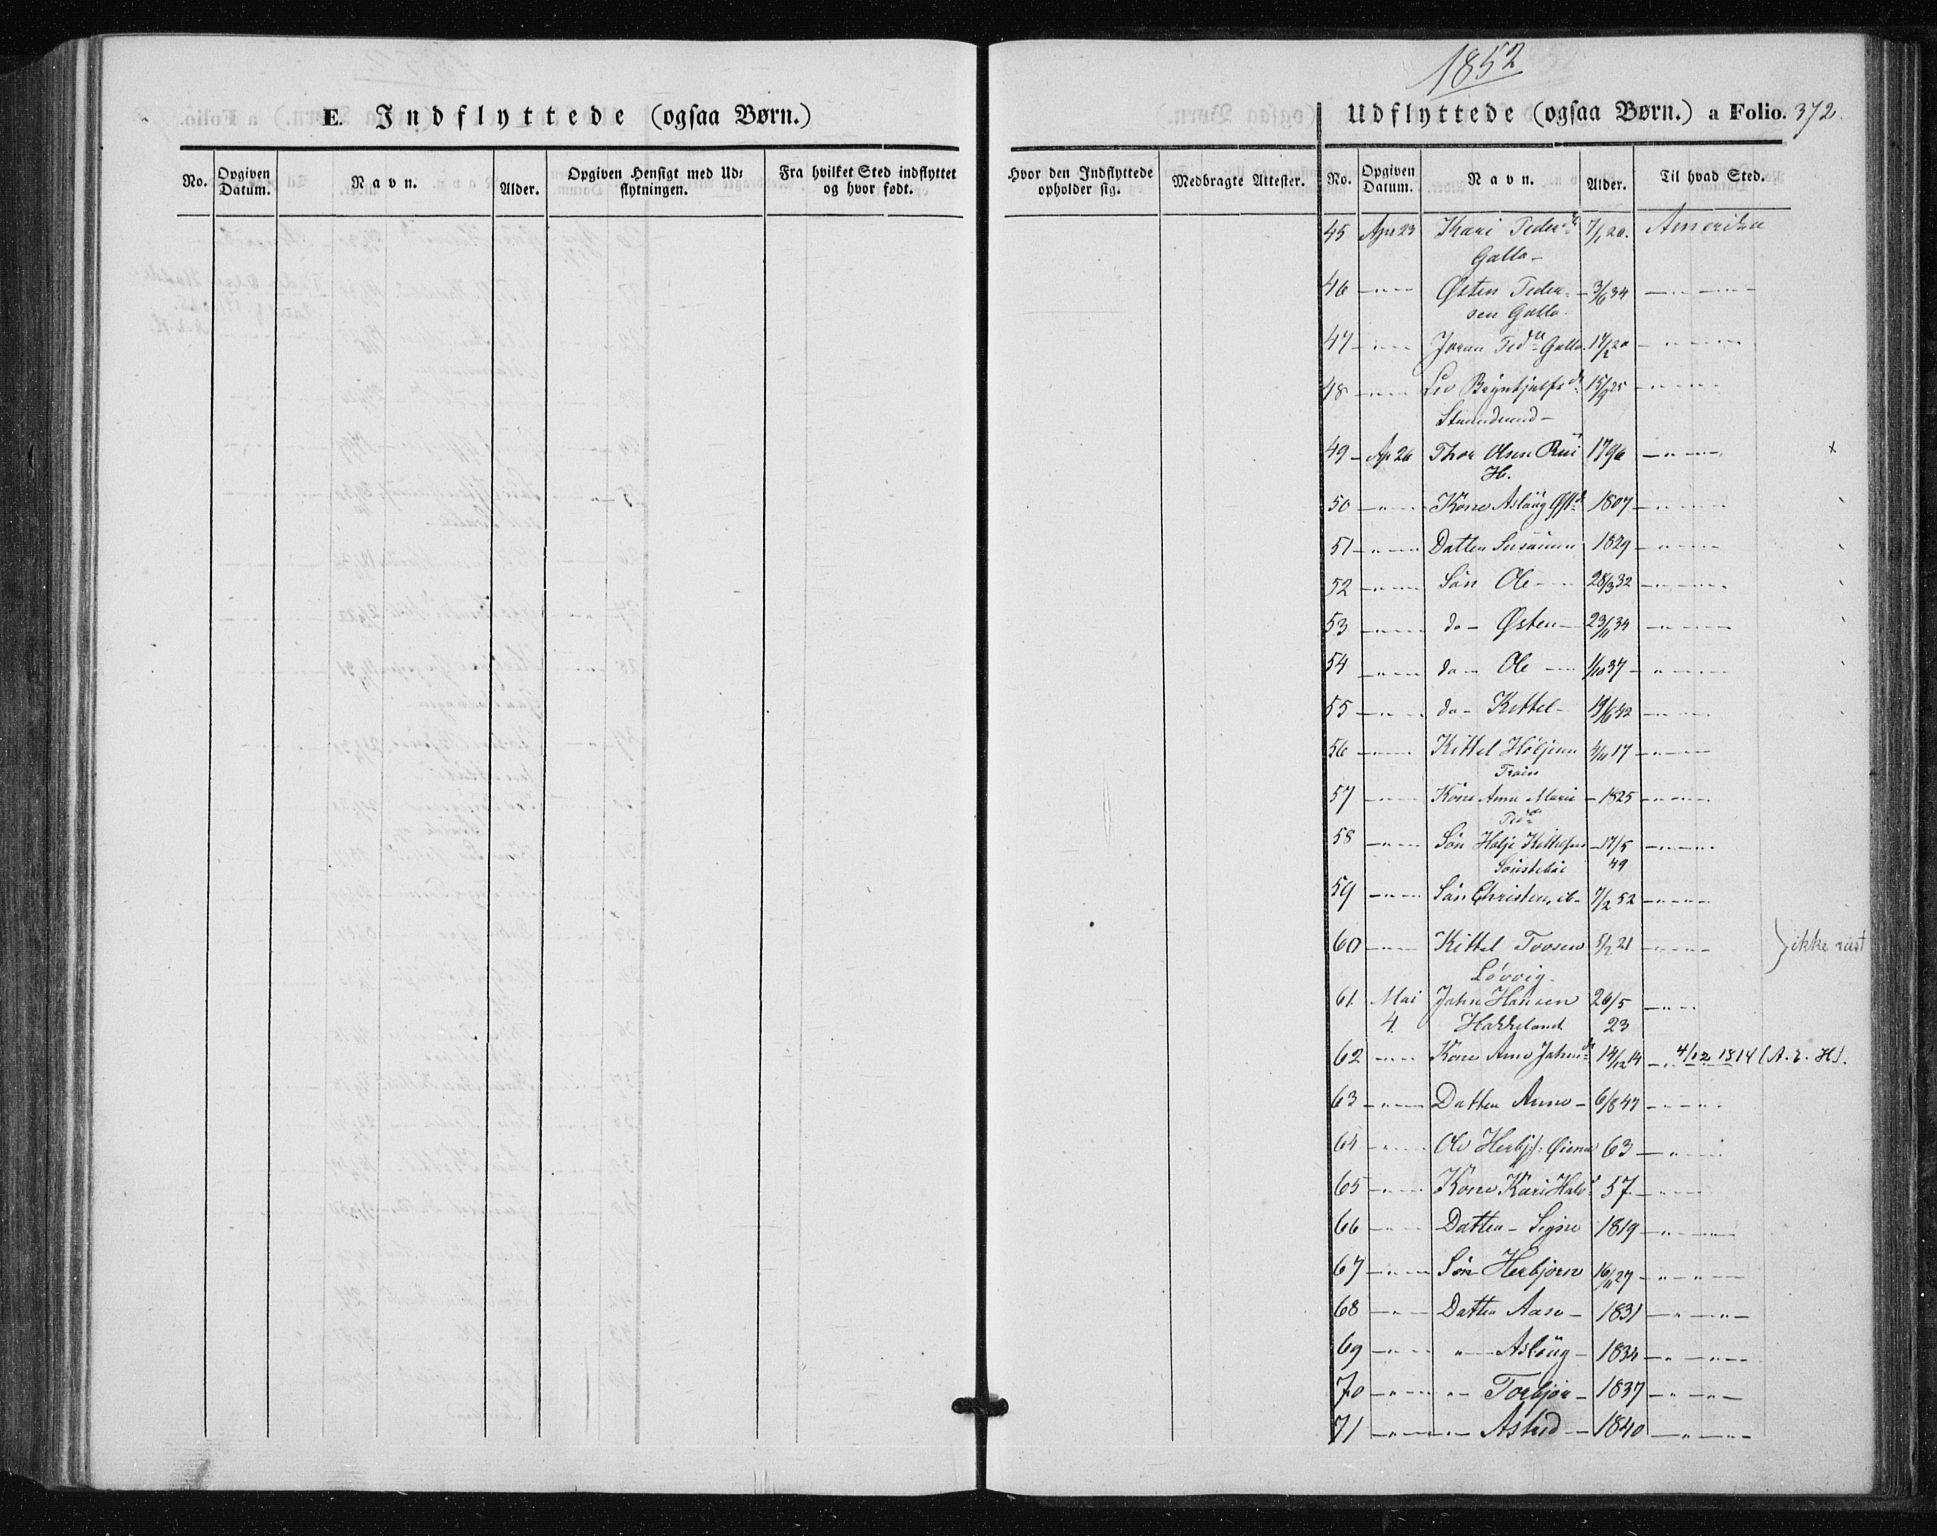 SAKO, Tinn kirkebøker, F/Fa/L0005: Ministerialbok nr. I 5, 1844-1856, s. 372